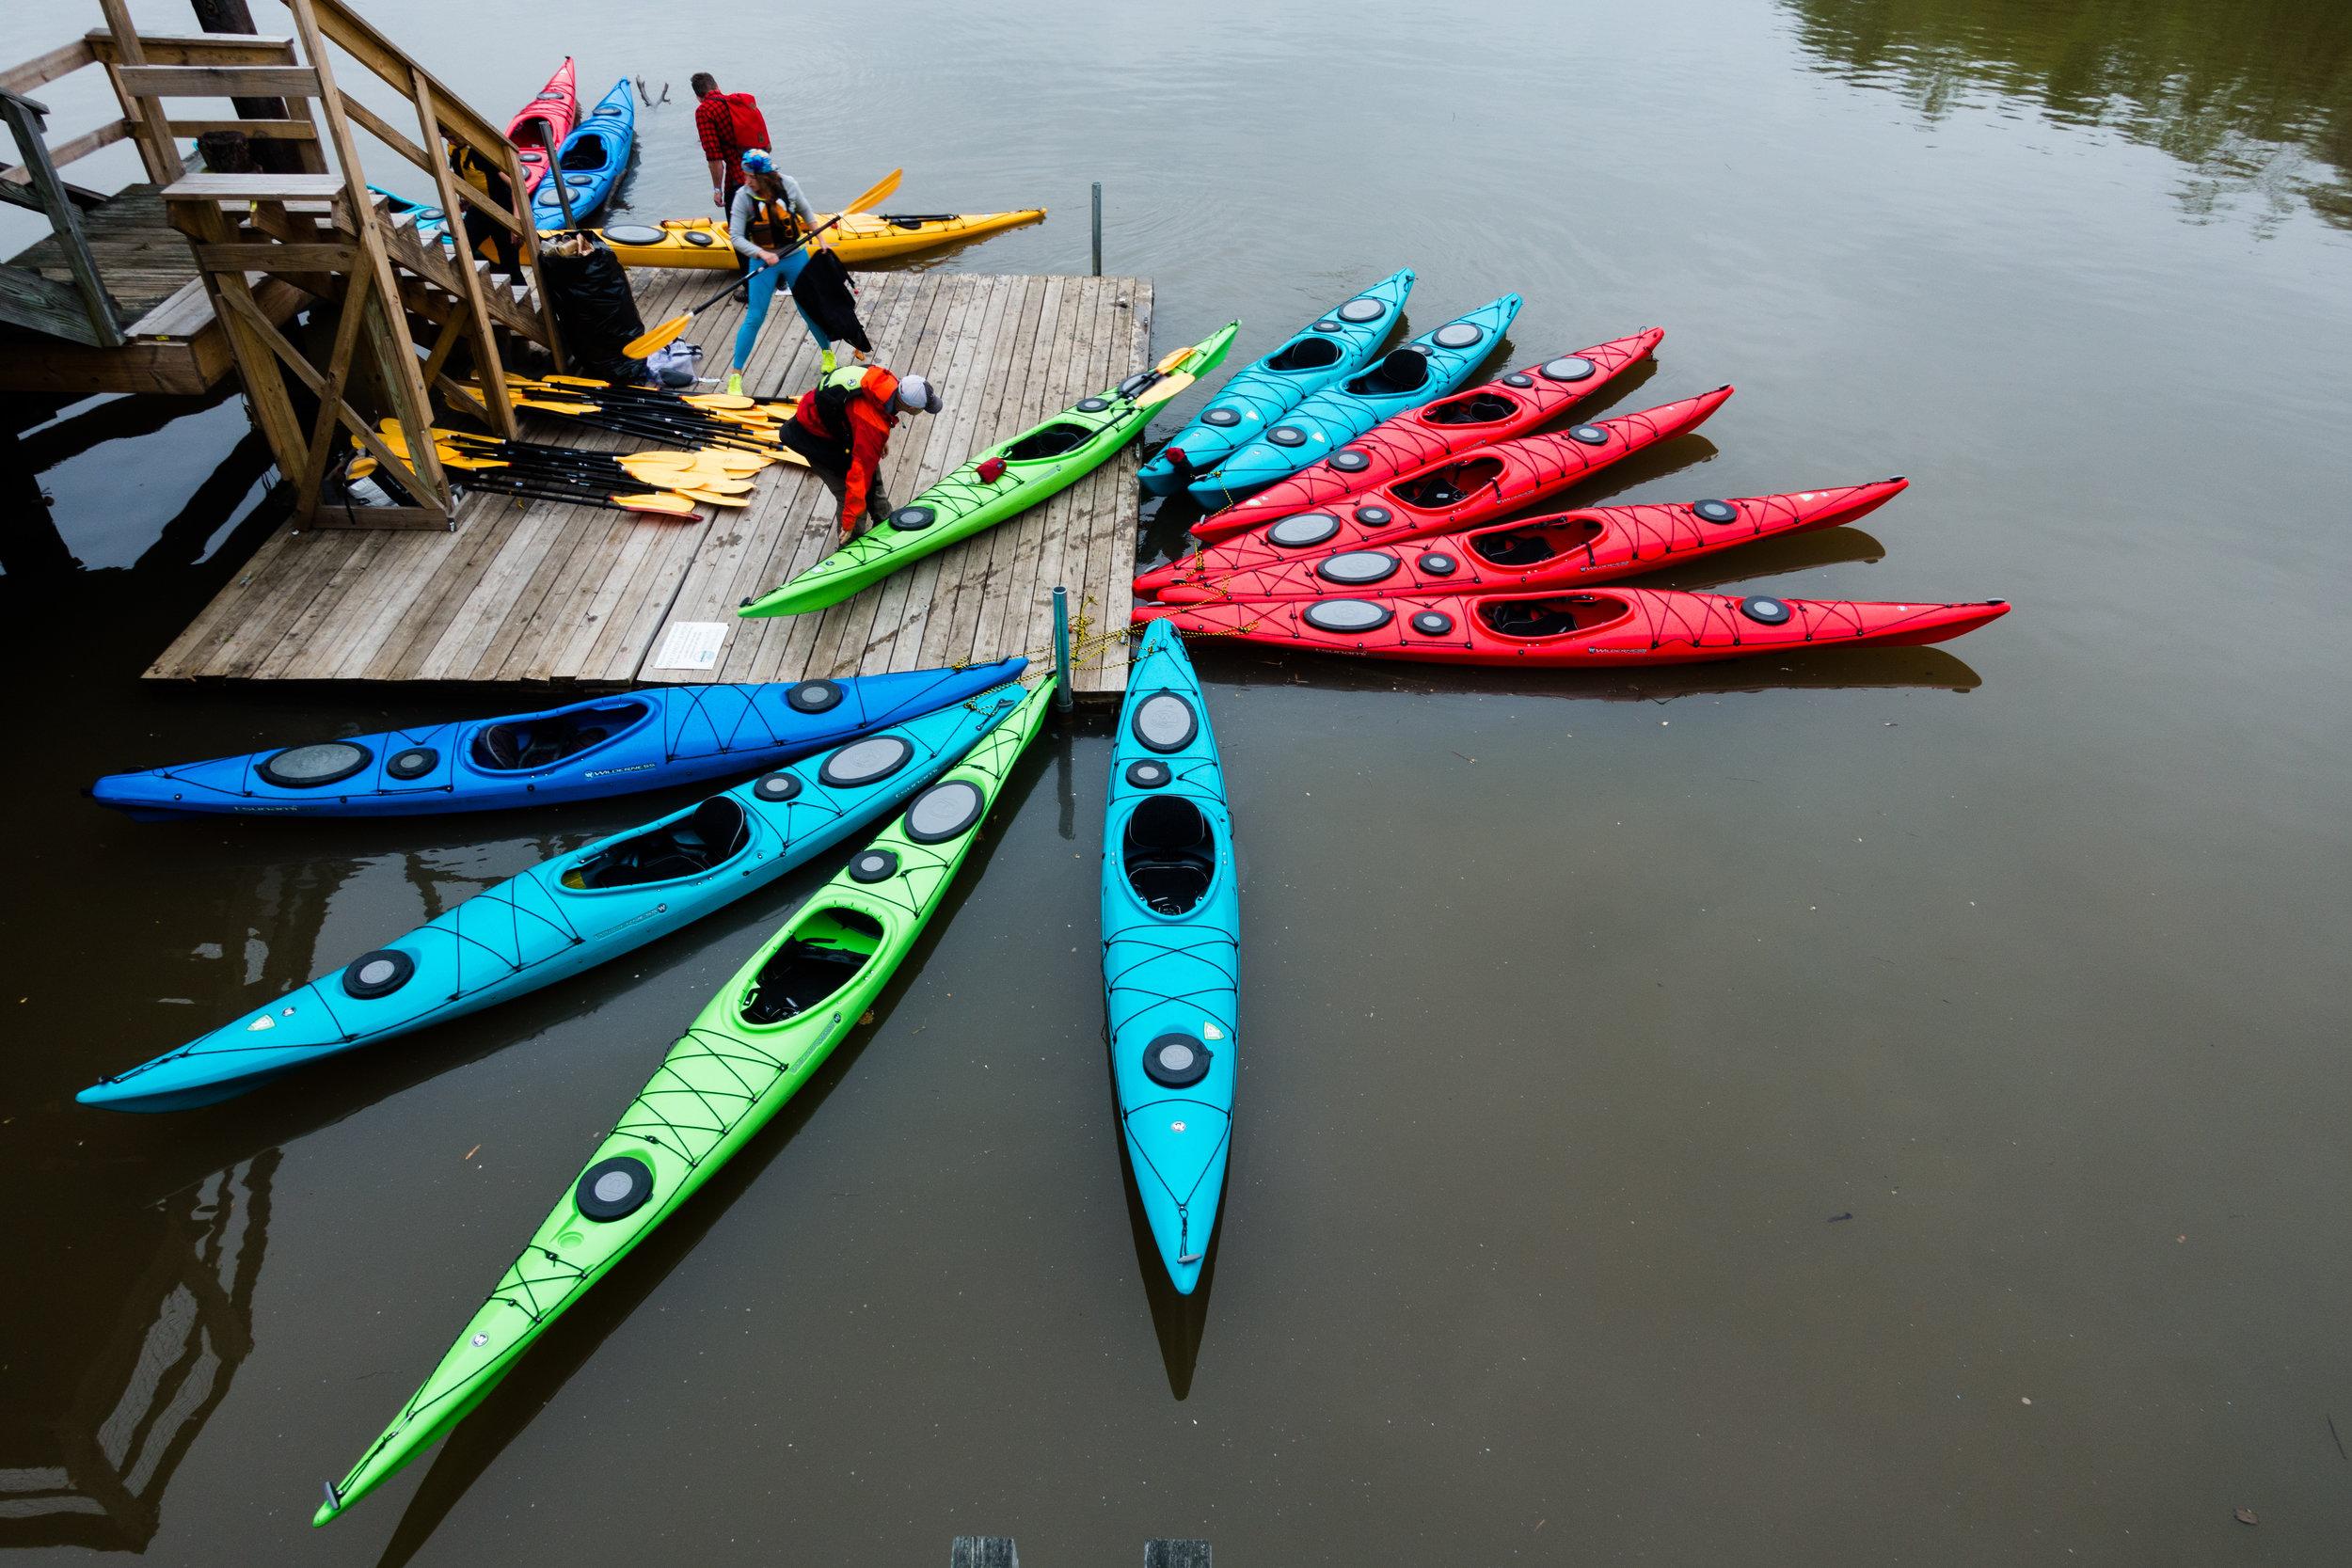 Kayaks on the Anacostia River near Kingman Island in Washington, D.C., Photo by Will Parson/Chesapeake Bay Program